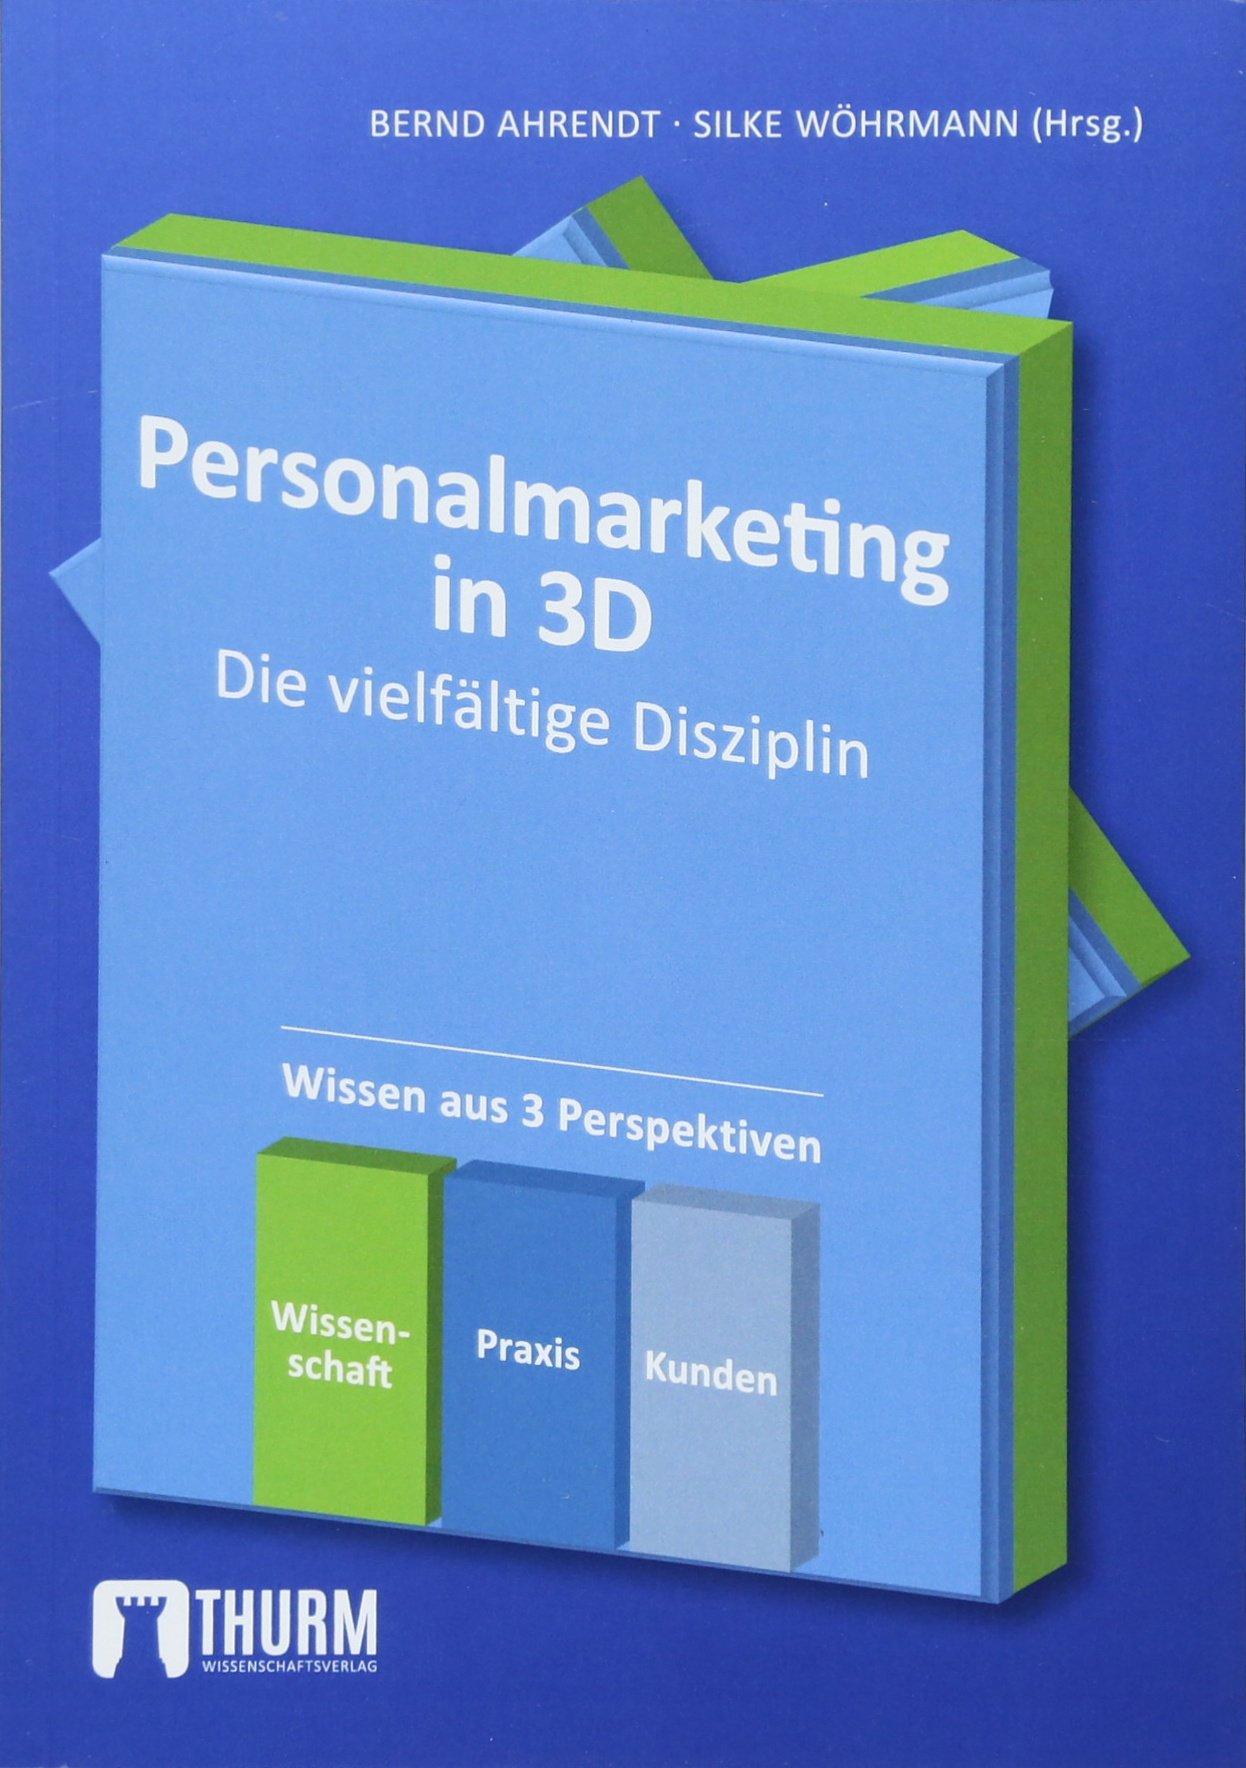 Personalmarketing in 3D: Die vielfältige Disziplin